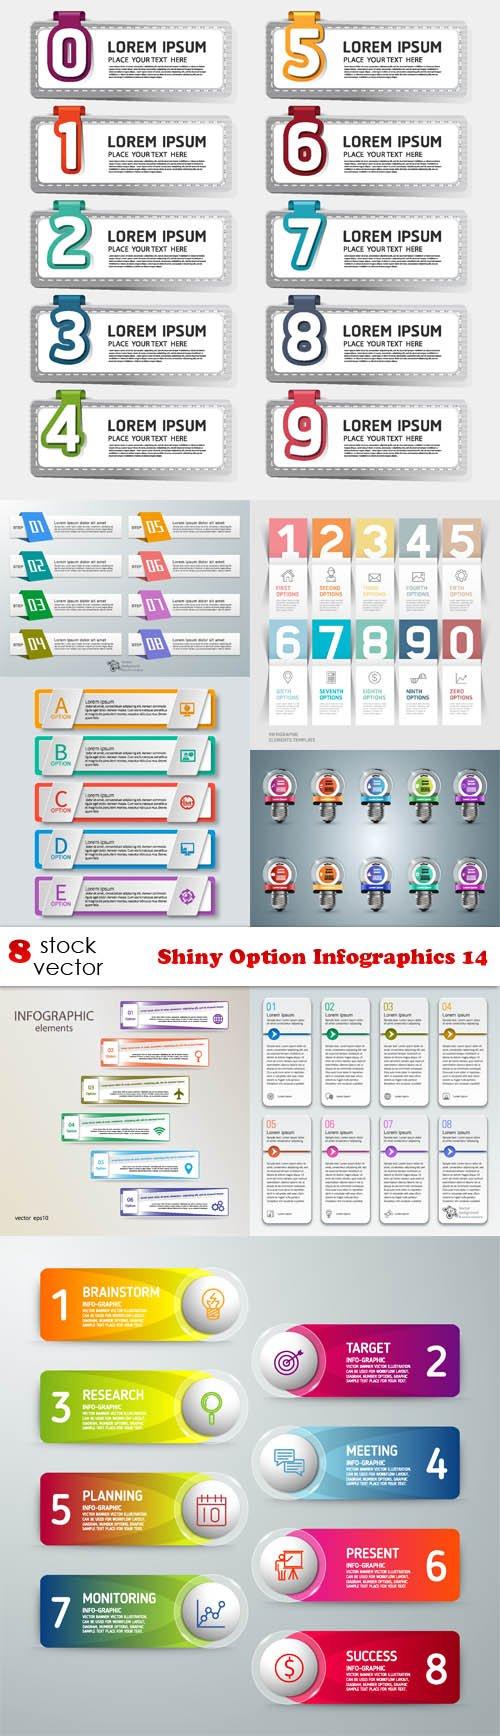 Vectors - Shiny Option Infographics 14